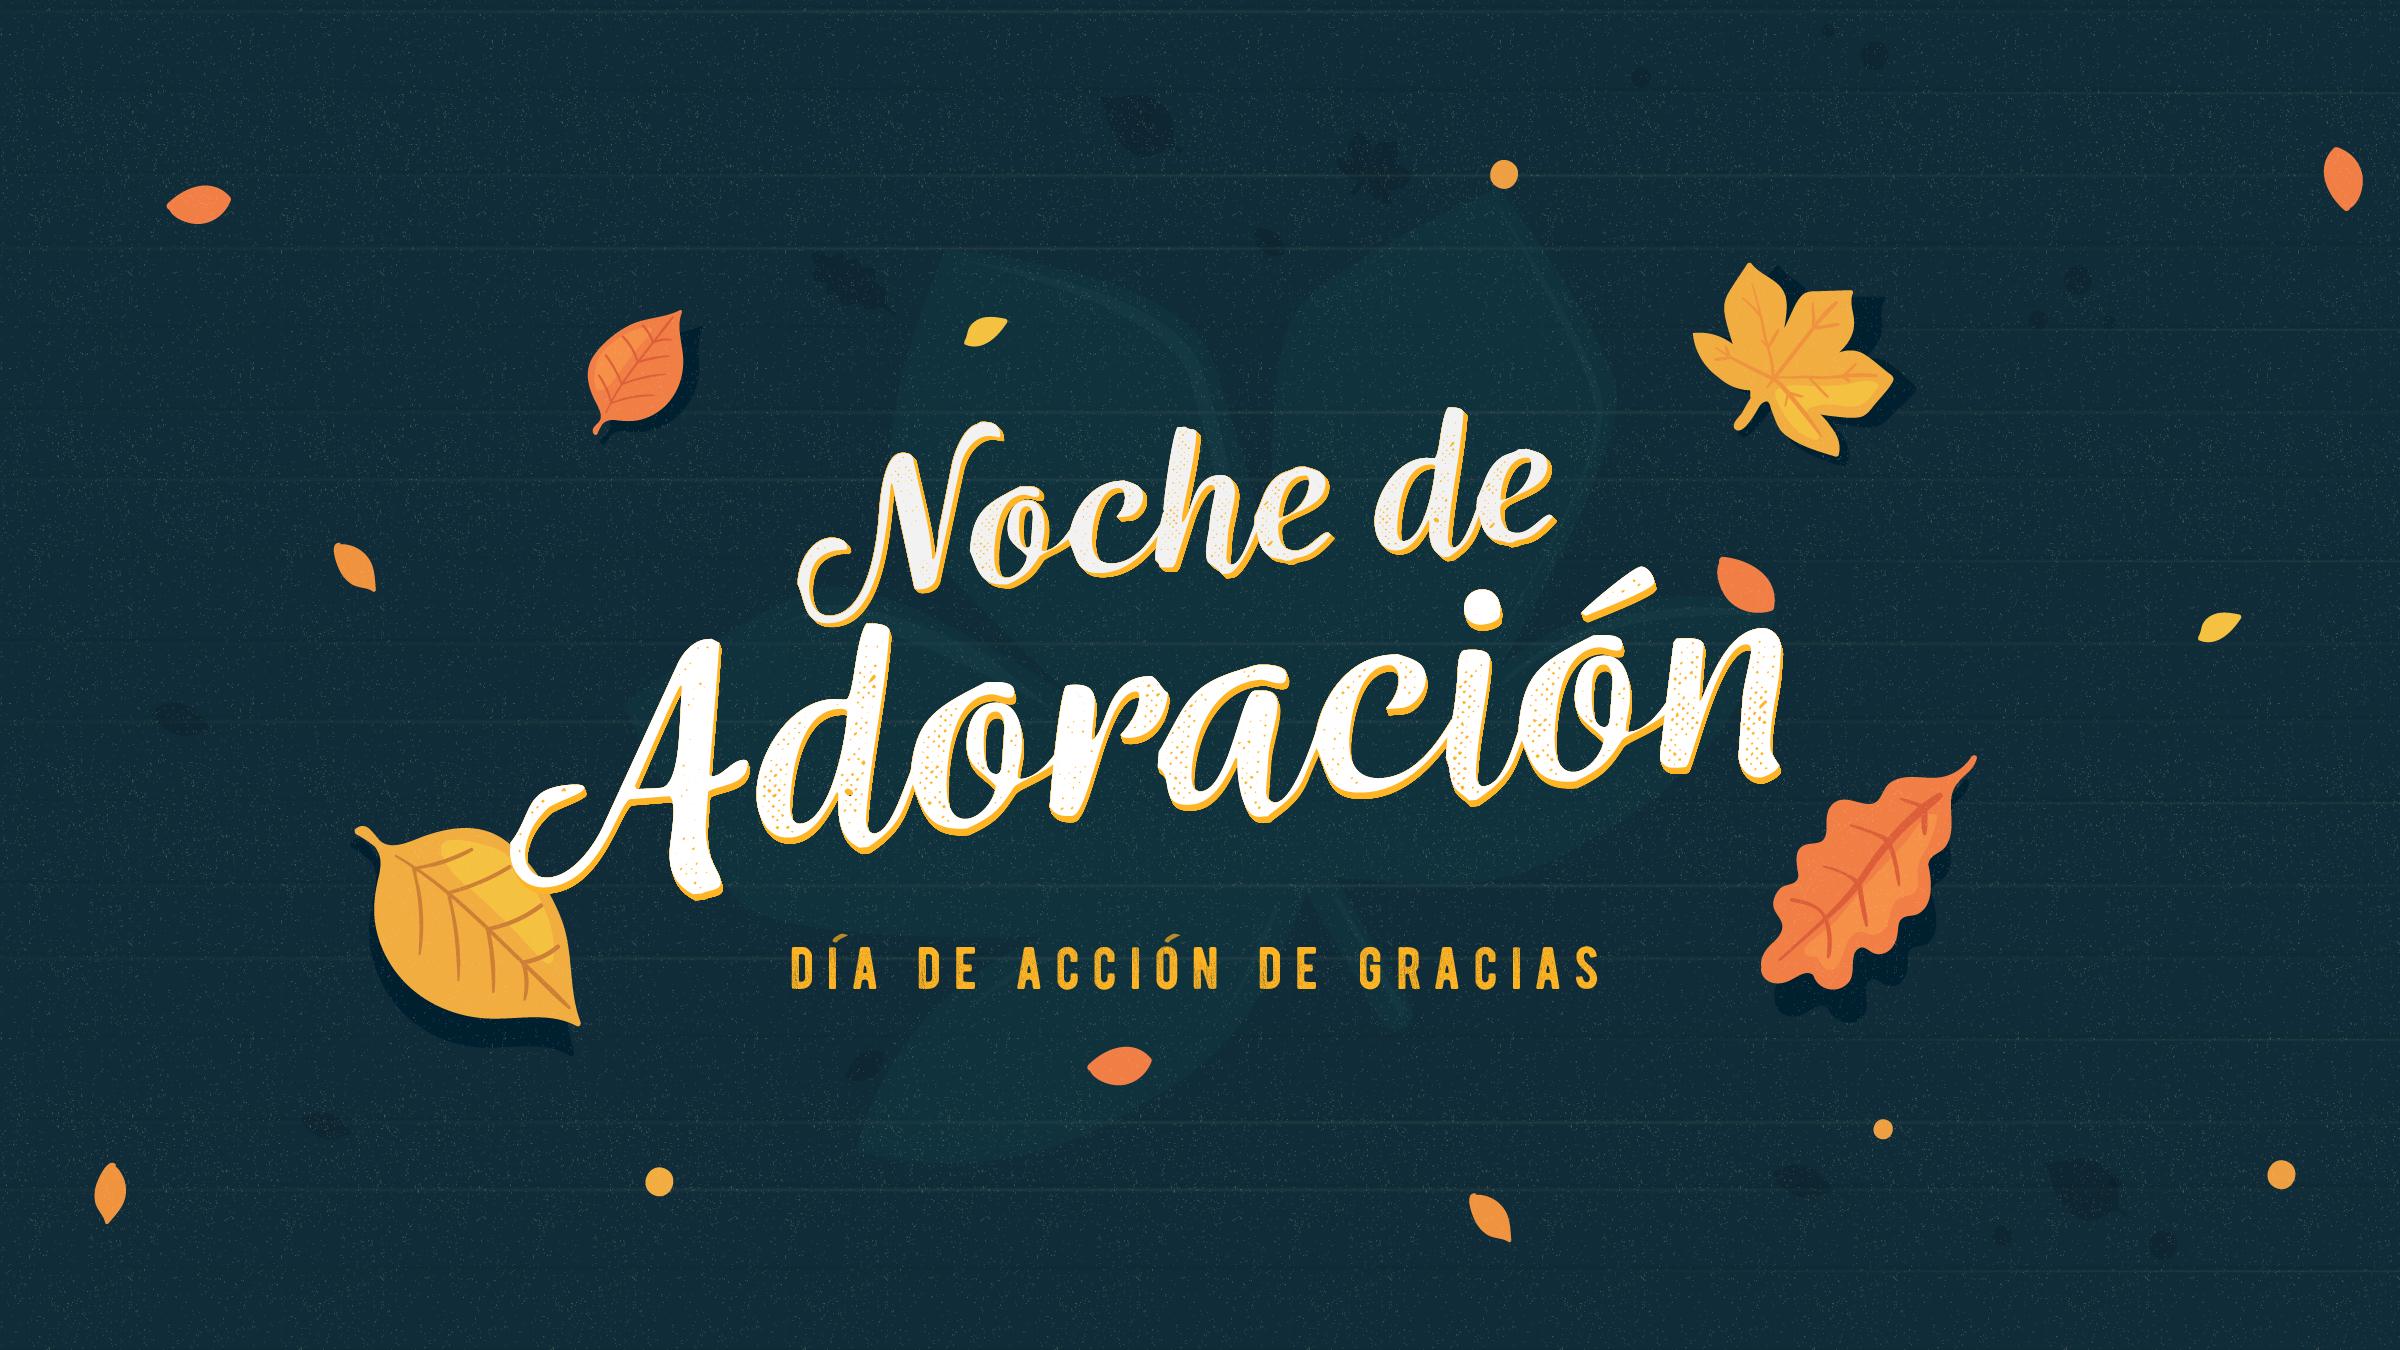 Noche de adoracion-01.png